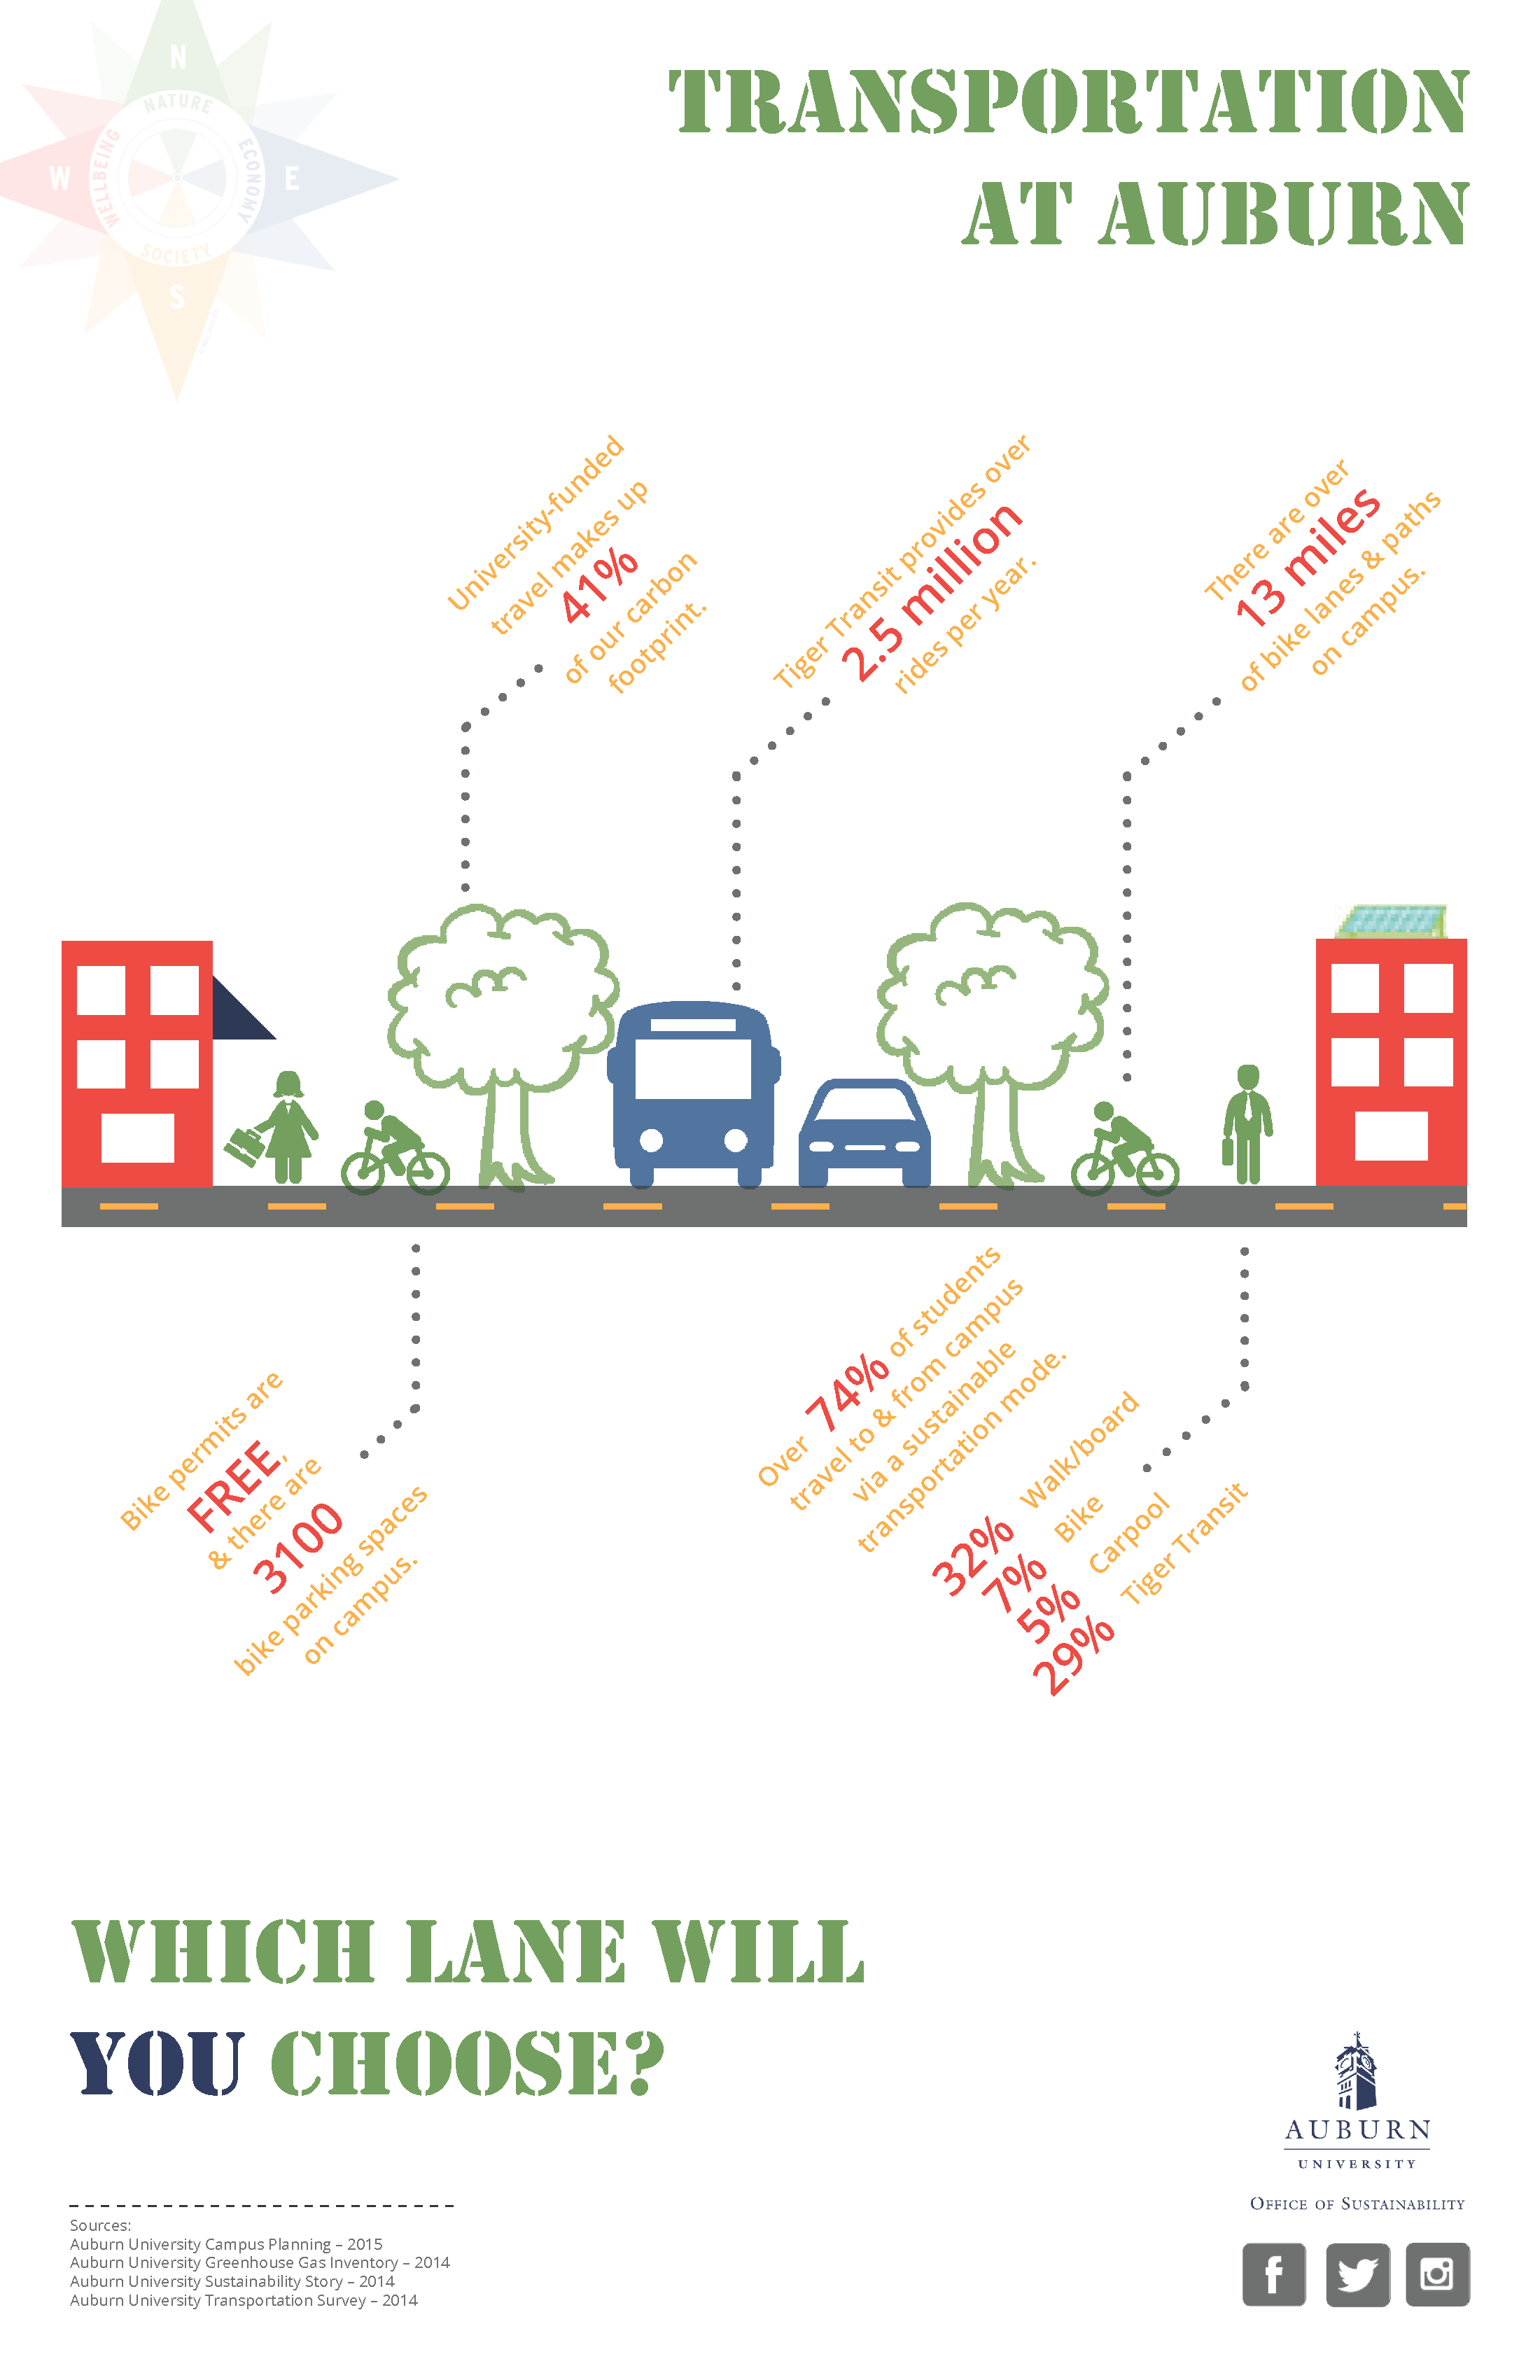 Graphic of Transportation Sept 2015